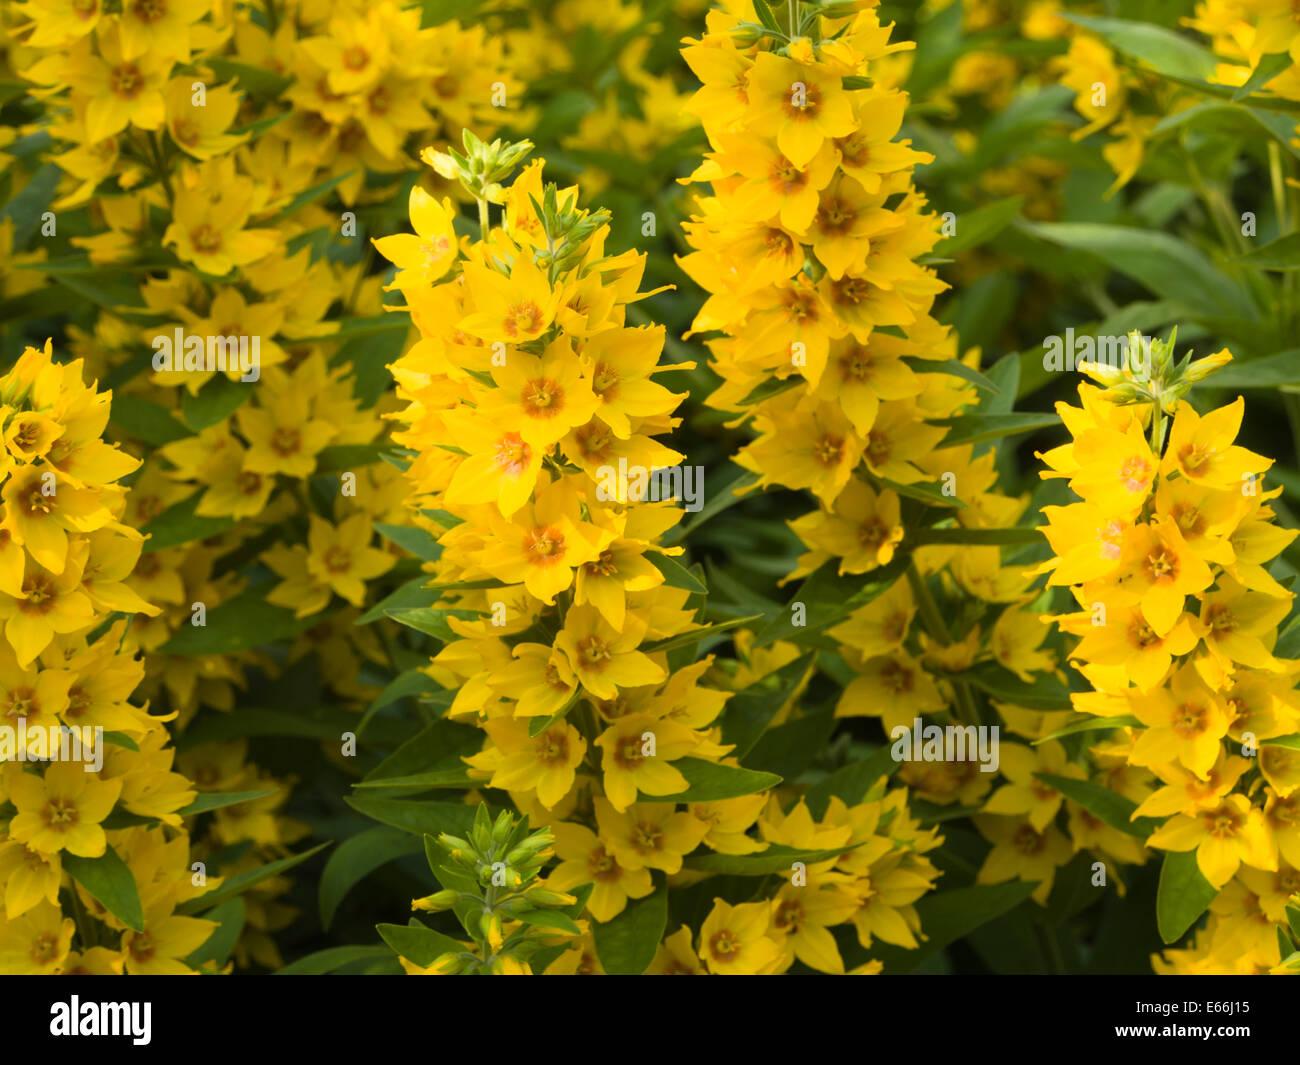 Garden yellow loosestrife stock photos garden yellow loosestrife lysimachia vulgaris yellow loosestrife or garden loosestrife grows willingly and spreads wherever planted here mightylinksfo